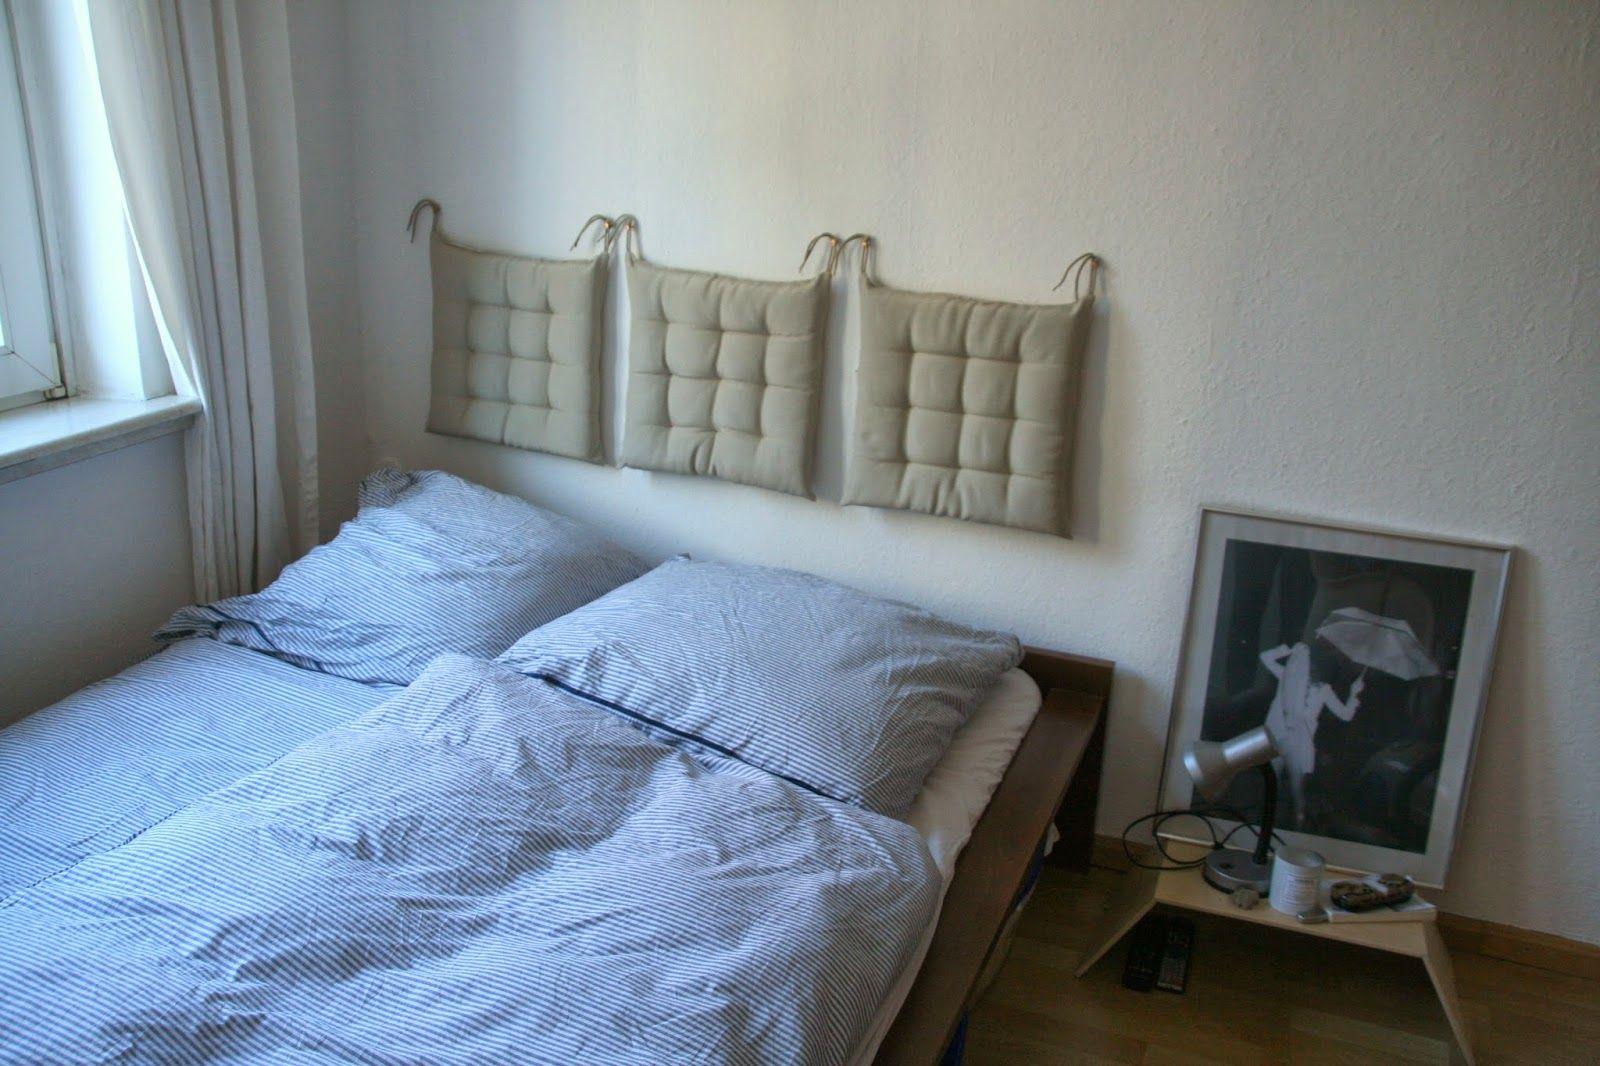 Full Size of Bett Rückwand 19 Leuchte Kopfteil Einzigartig Bettkasten 120 Bonprix Betten Breit Leander Selber Zusammenstellen 100x200 Günstig Kaufen Weisses 160x200 Bett Bett Rückwand